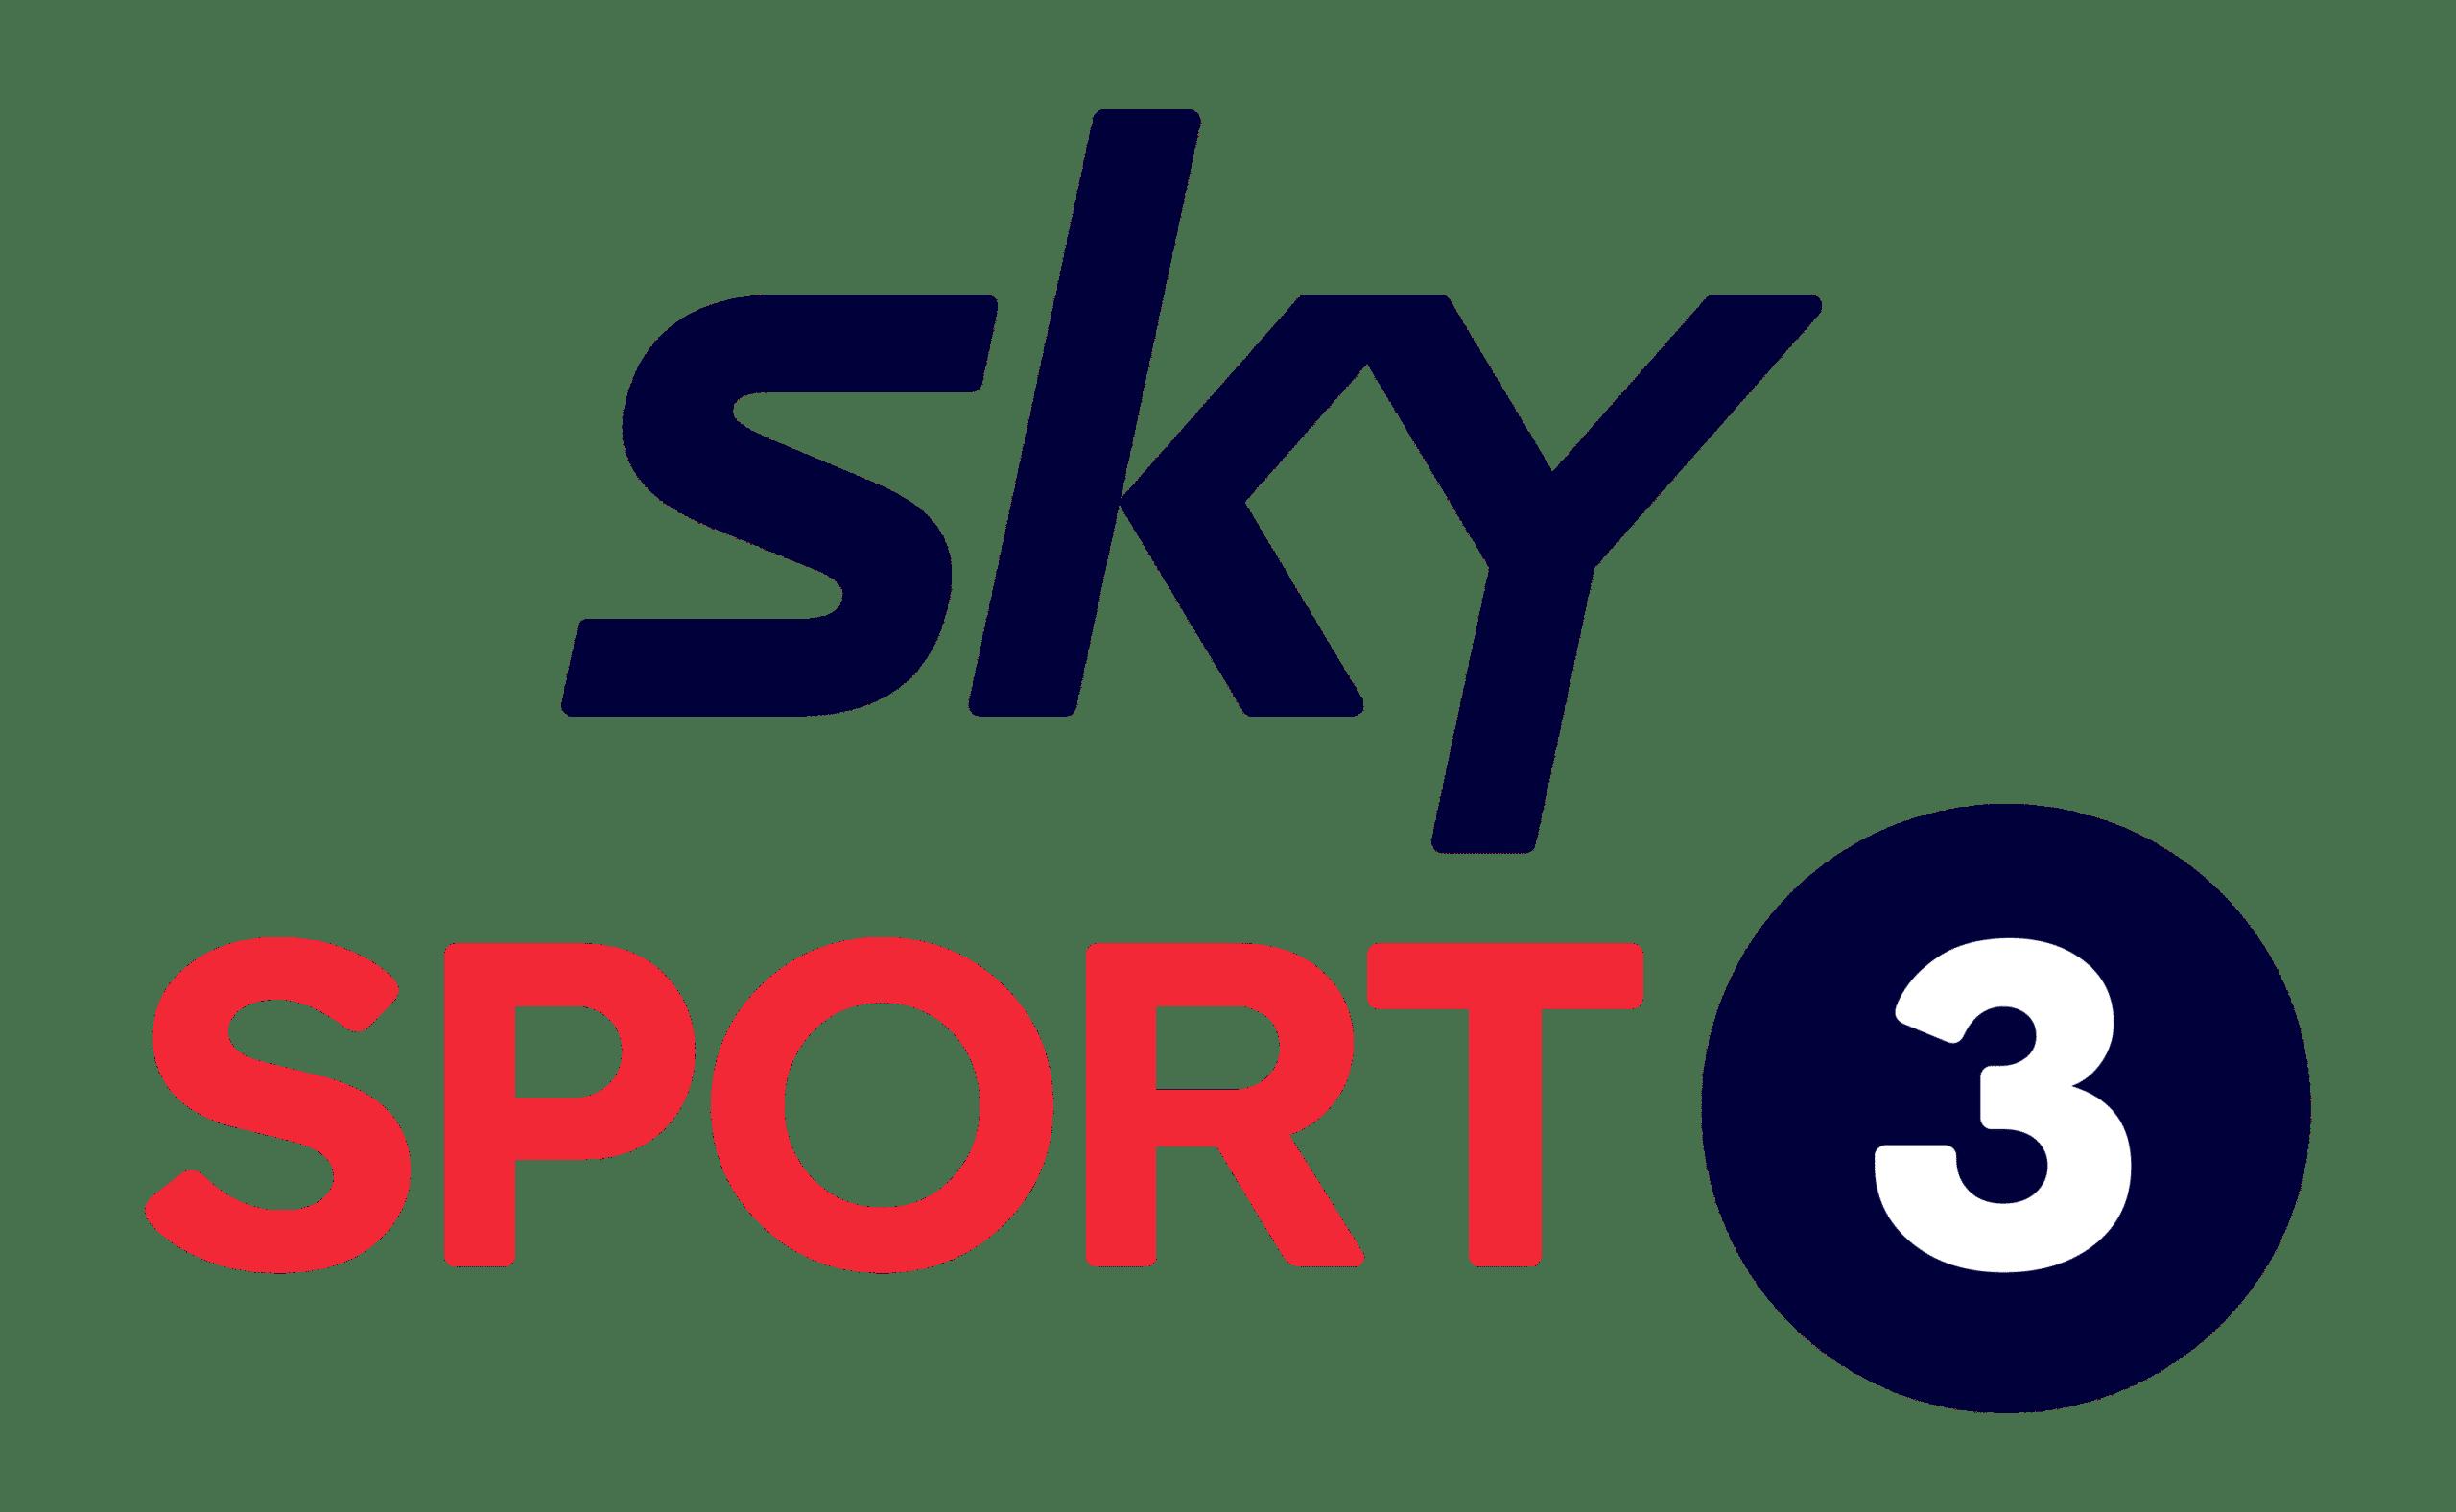 051 sky sport 3 logo stack rgb